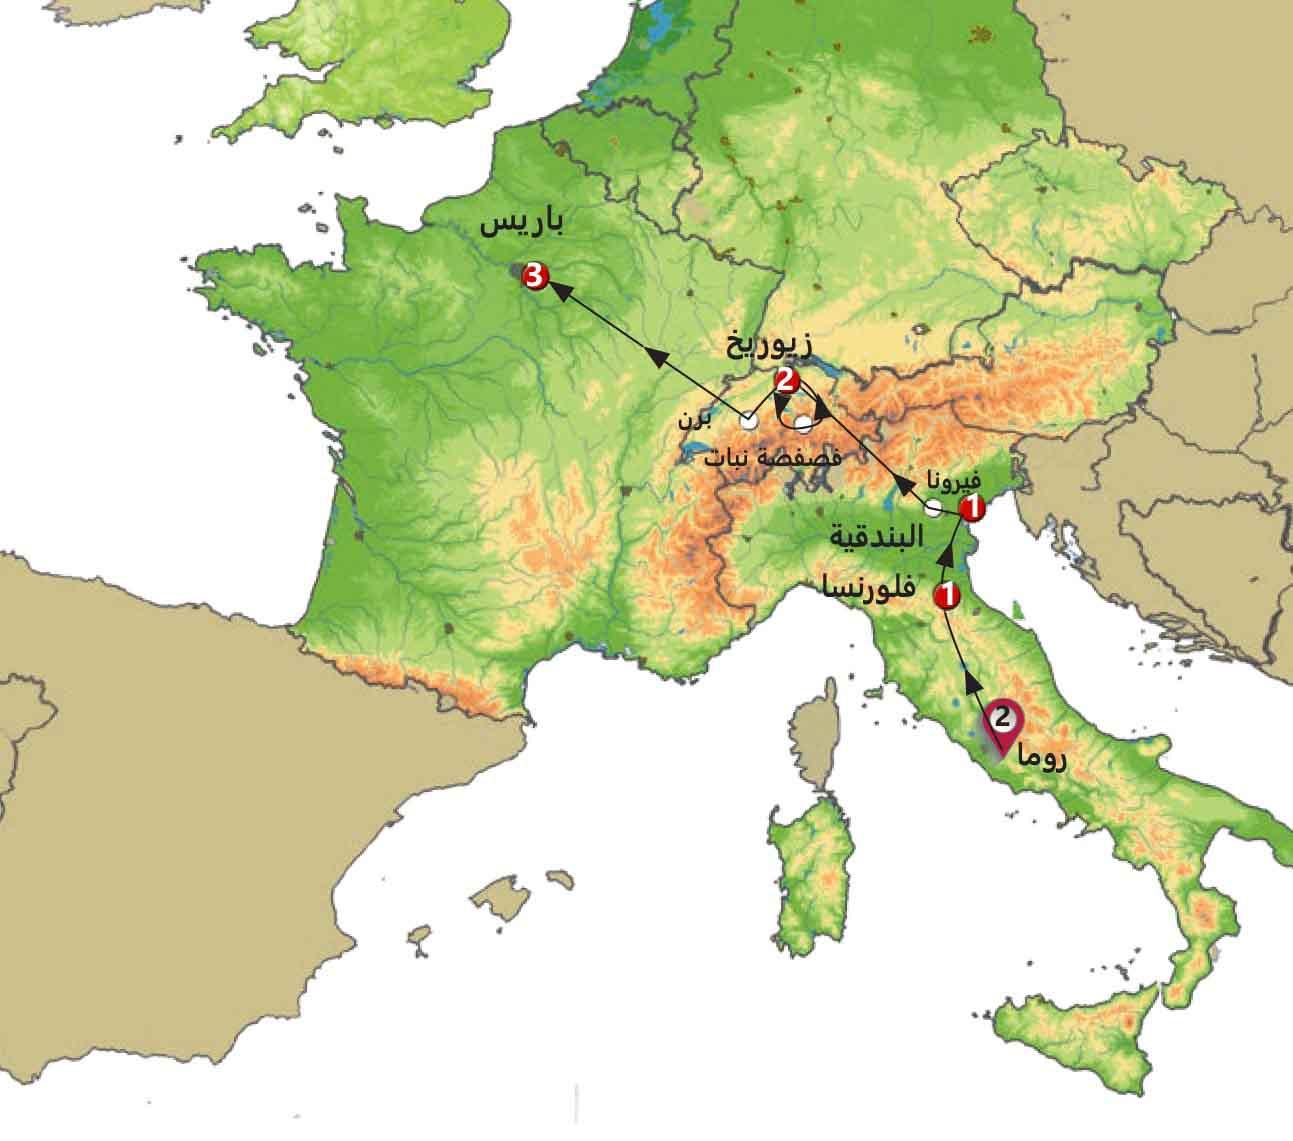 ايطاليا وسويسرا وباريس